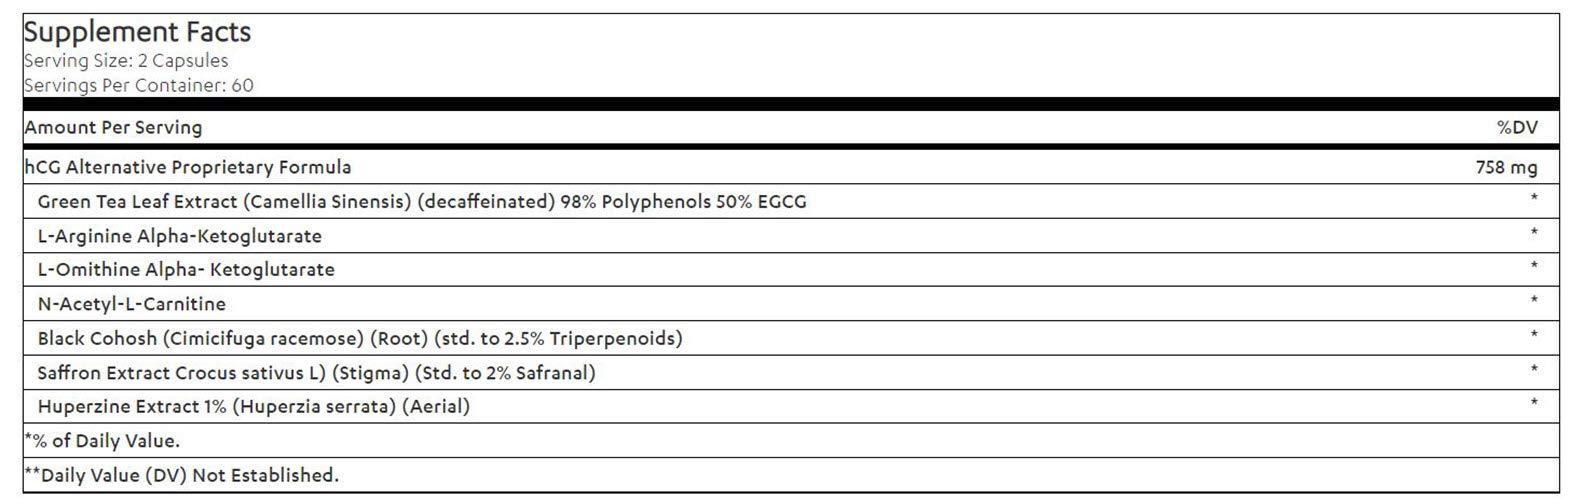 Biogentic Laboratories hCG Alternative Weight Loss Formula 2 Pack   60 Day Supply (120 Capsules per Bottle) Bonus Diet Plan Included   Hormone- Free, Stimulant- Free by Bio genetic Labs